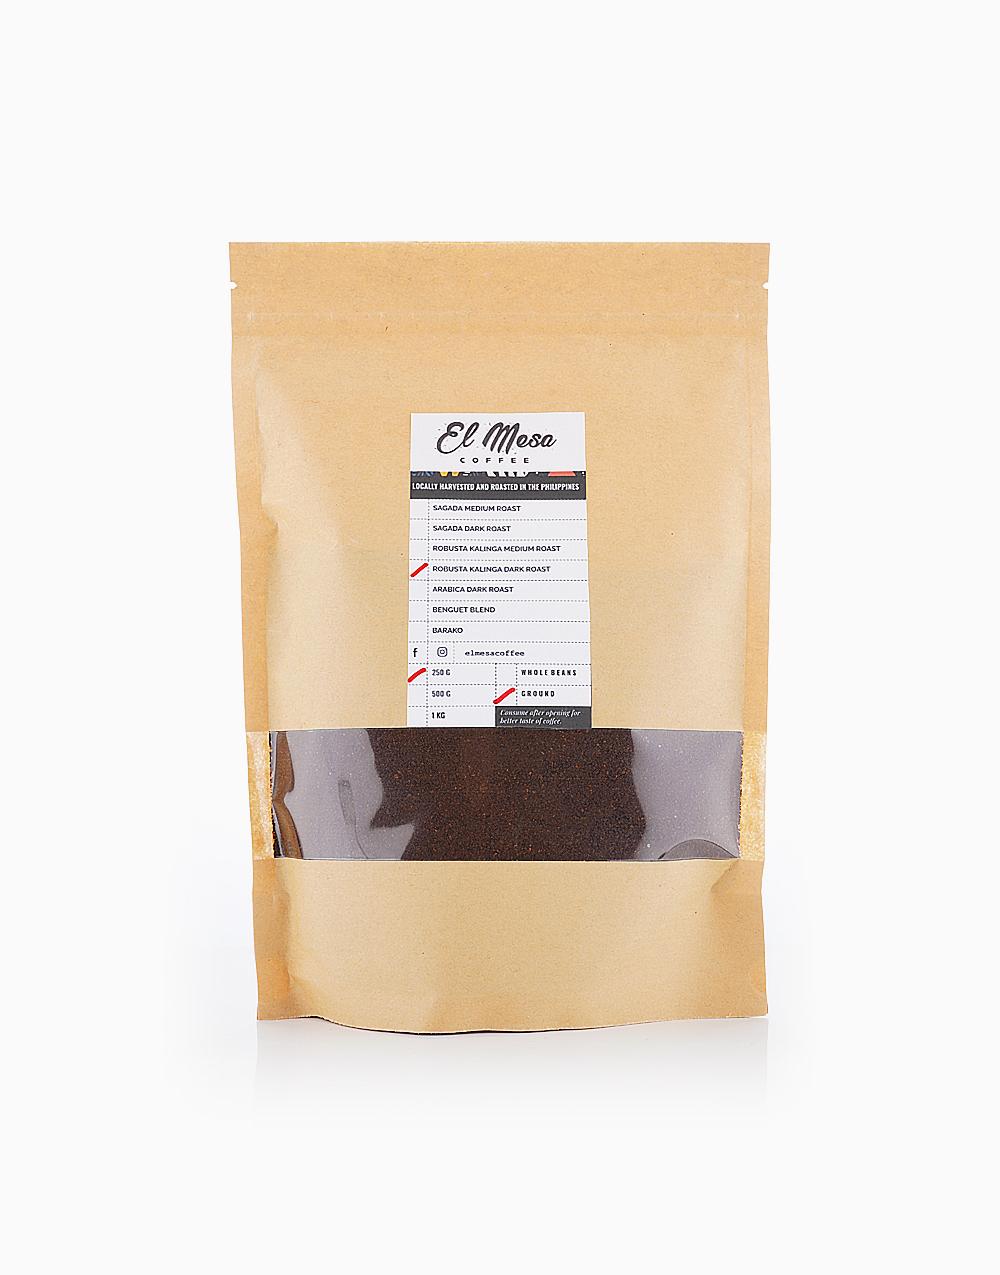 Robusta Kalinga Dark Roast Coffee Grounds by El Mesa Coffee